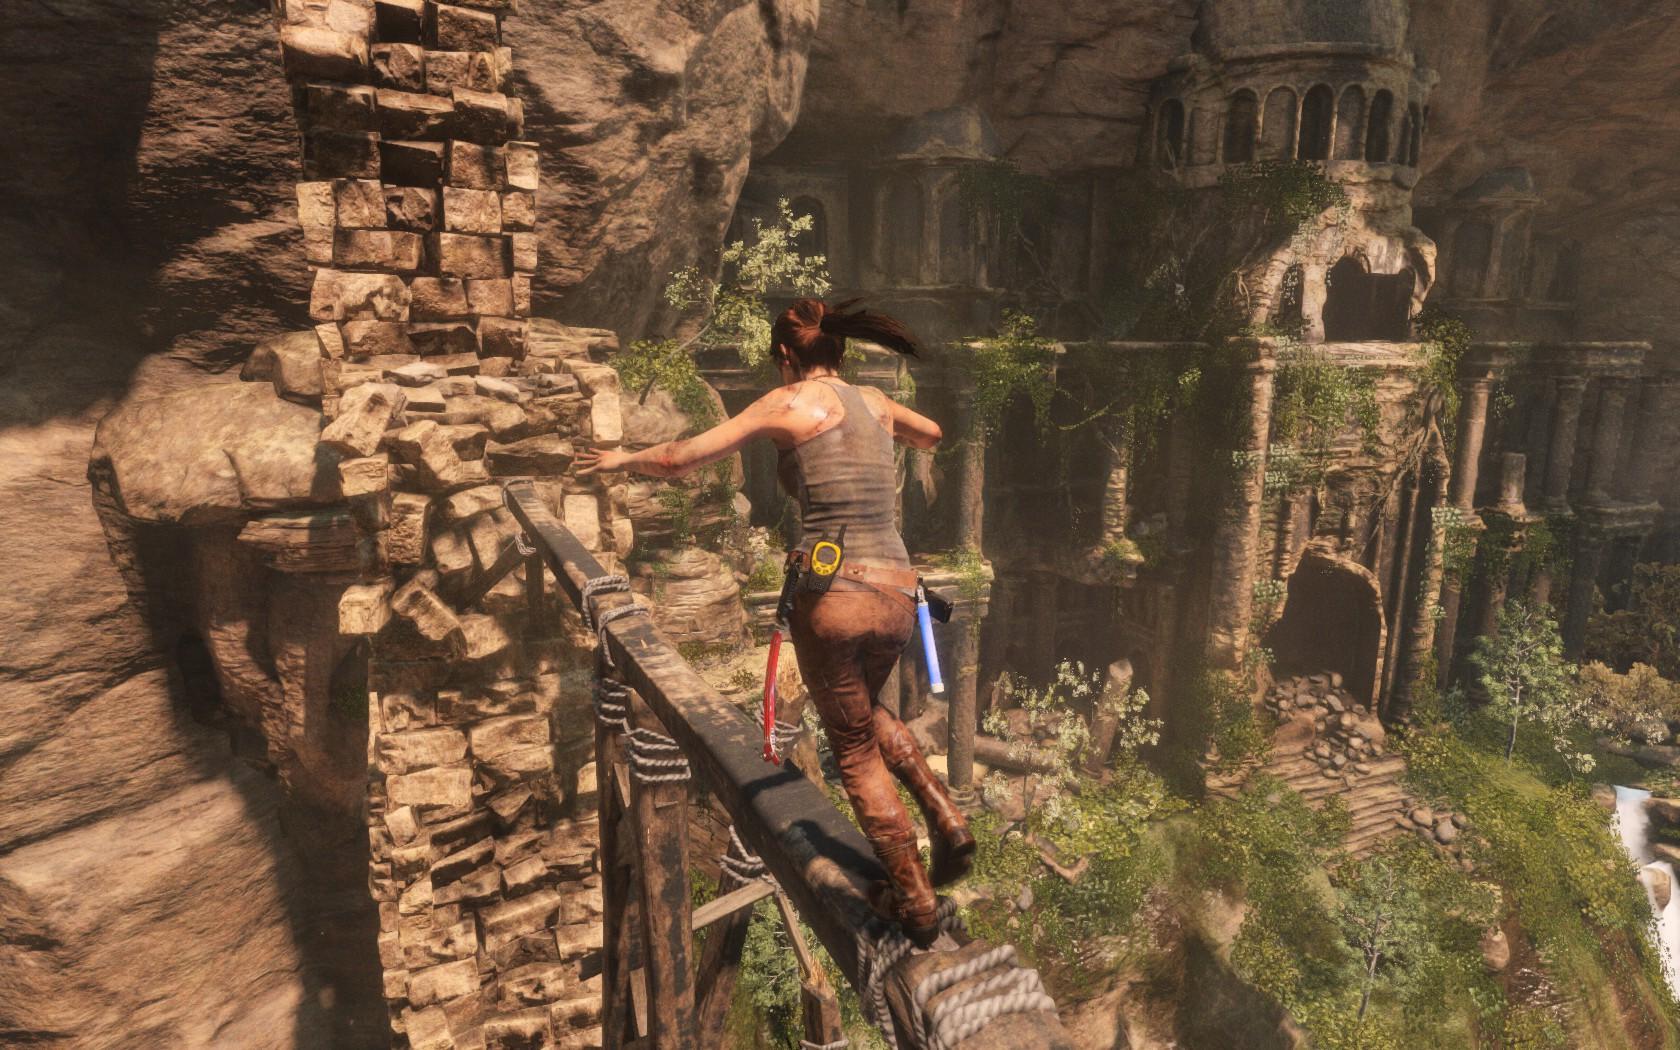 Rise of the Tomb Raider - PC verze pod drobnohledem 118489